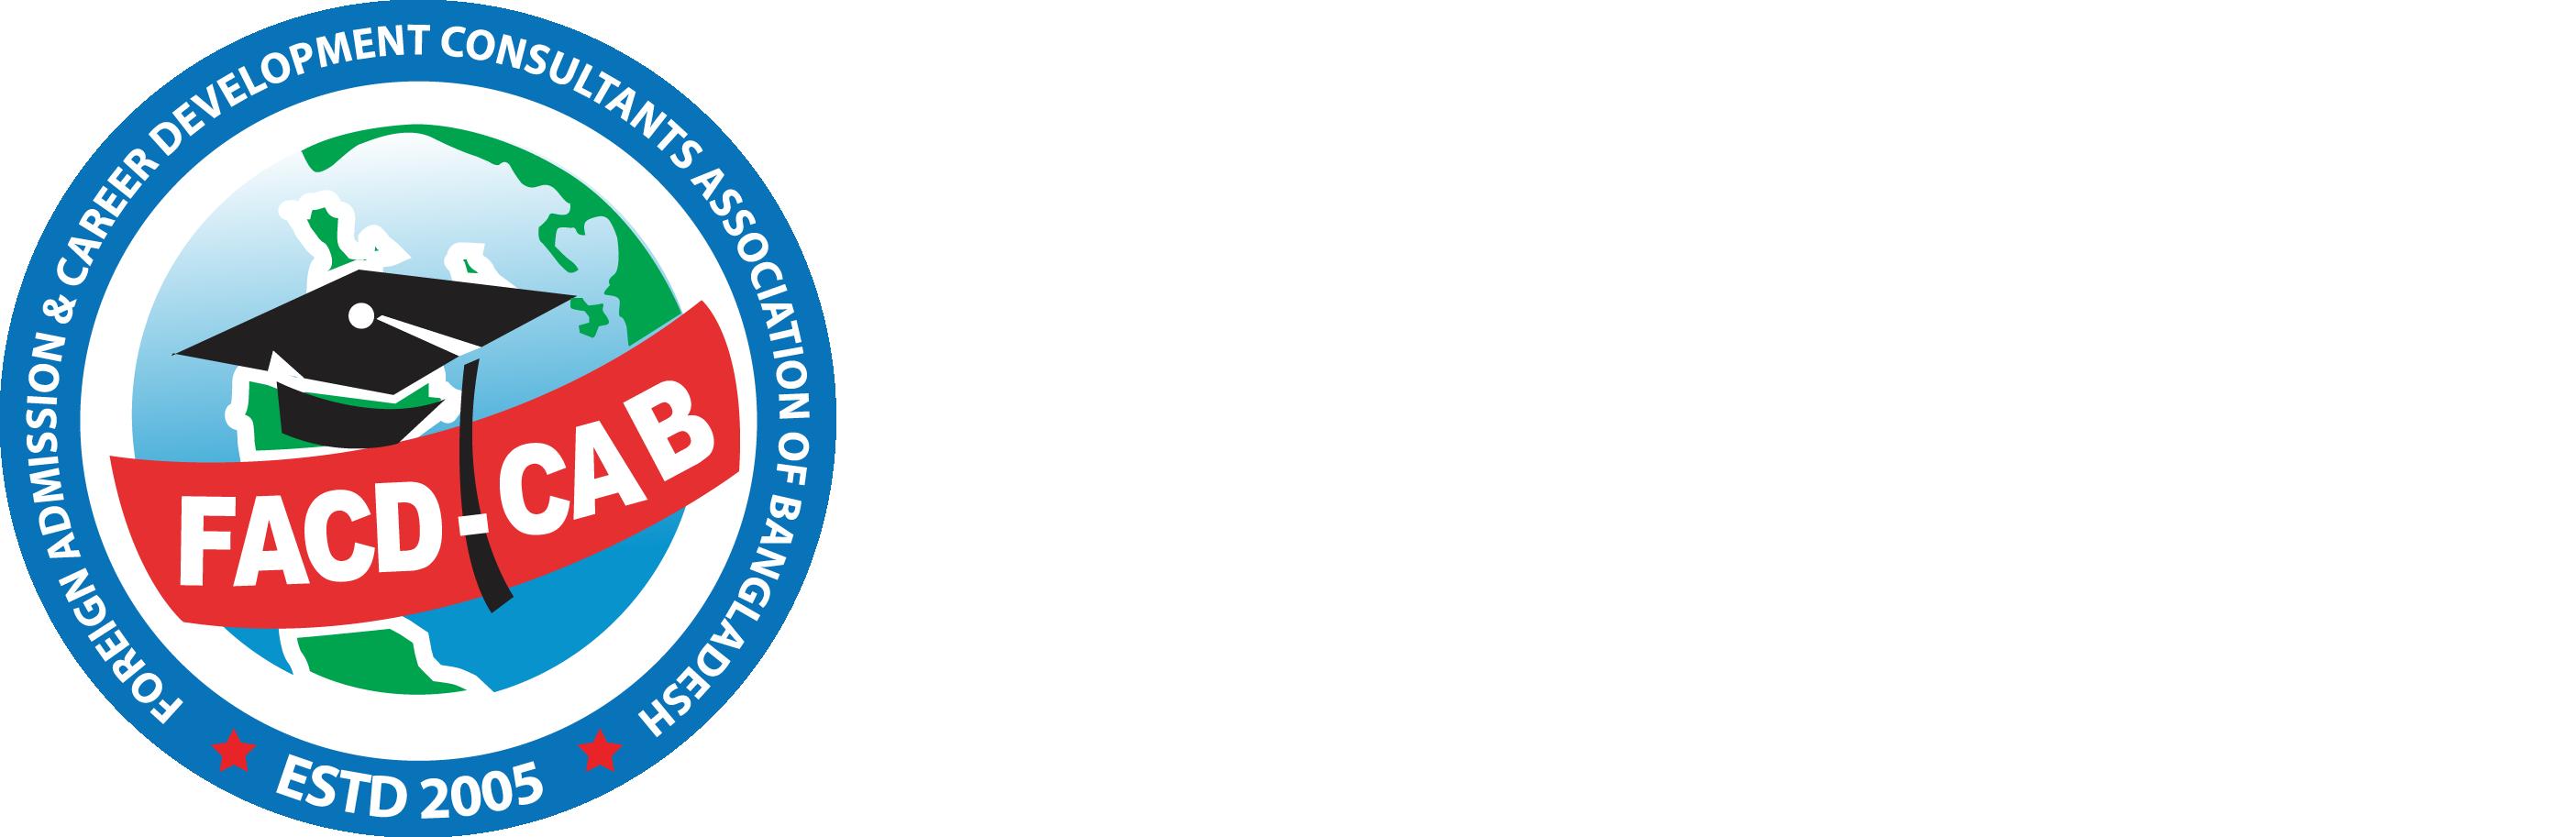 FACD-CAB